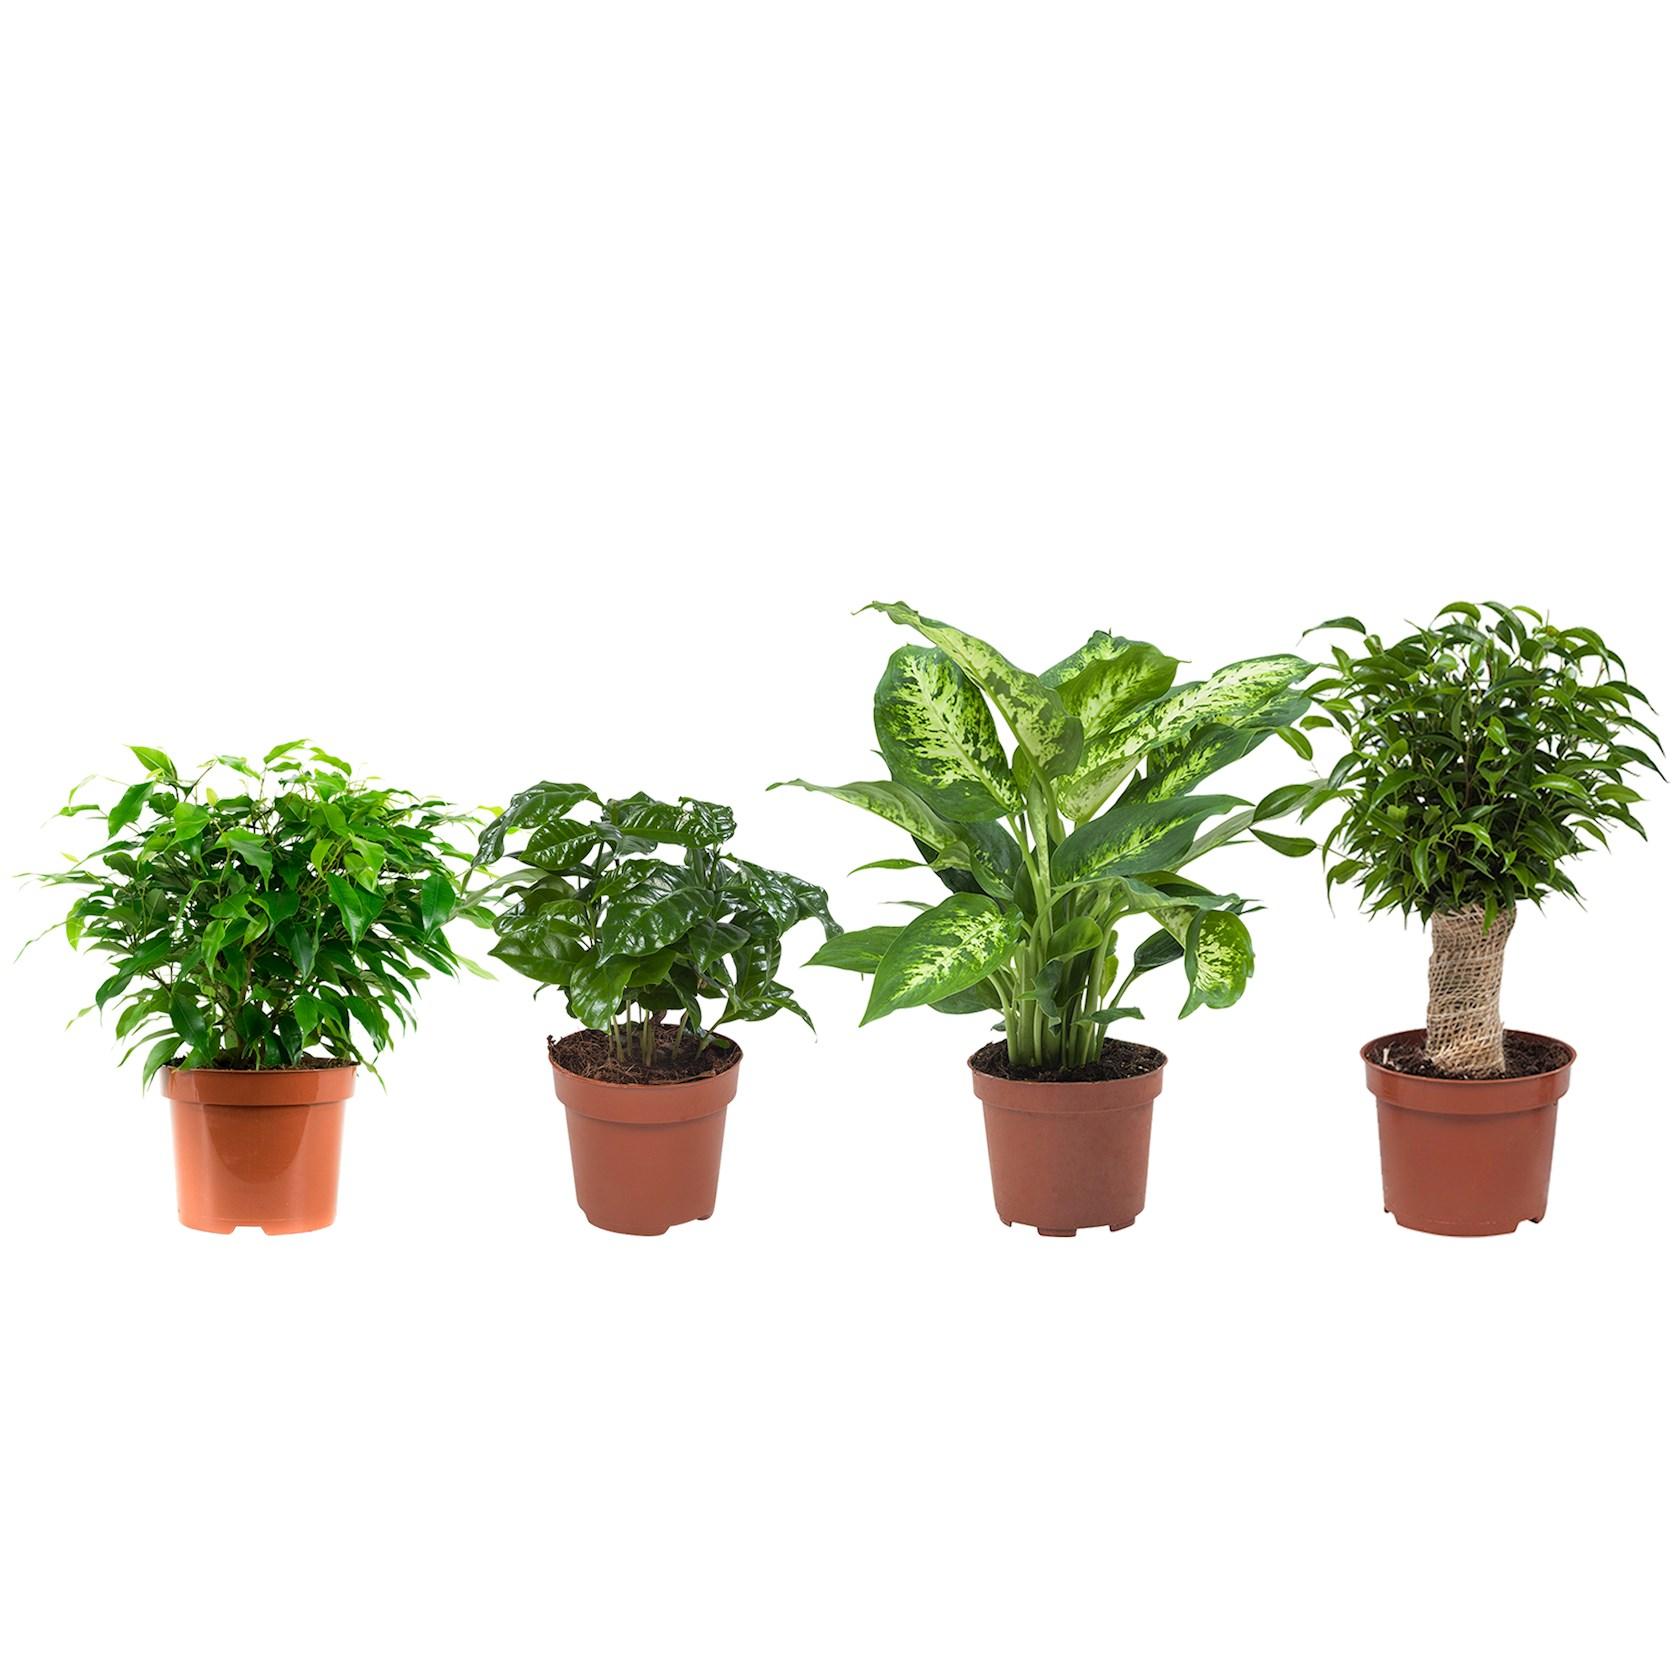 4 stuks Ficus (Ficus Green Kinky), Koffieplant (Coffea Arabica), Dieffenbachia (Dieffenbachia Compacta), Ficus (Ficus Natasja) - pot 12cm - hoogte 25cm